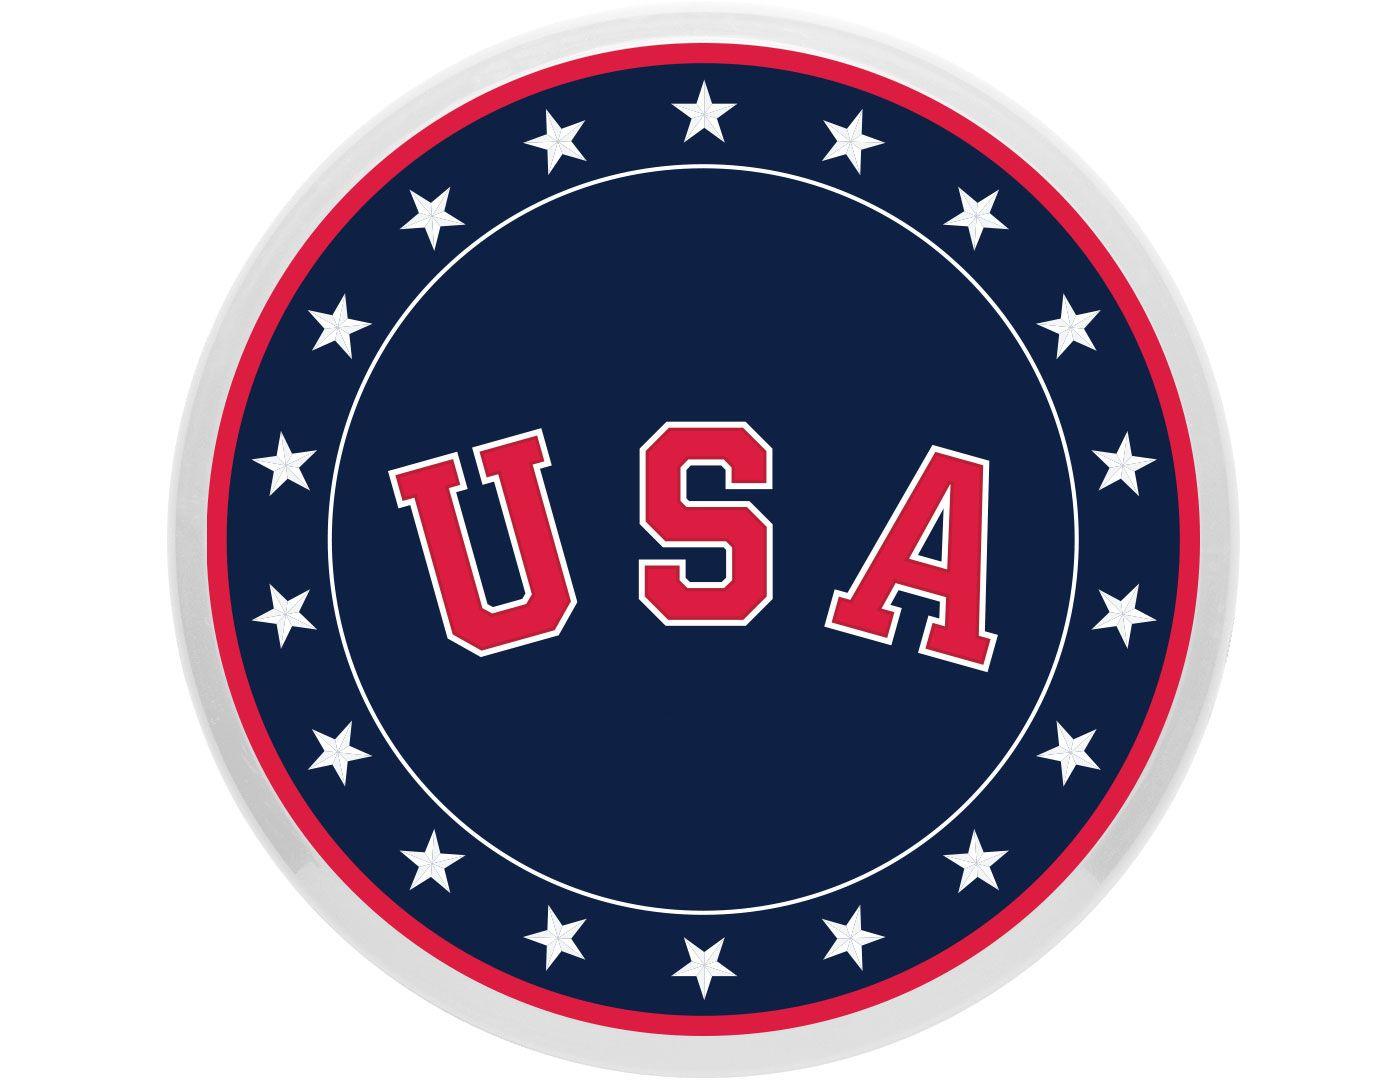 KanJam USA Flying Disc